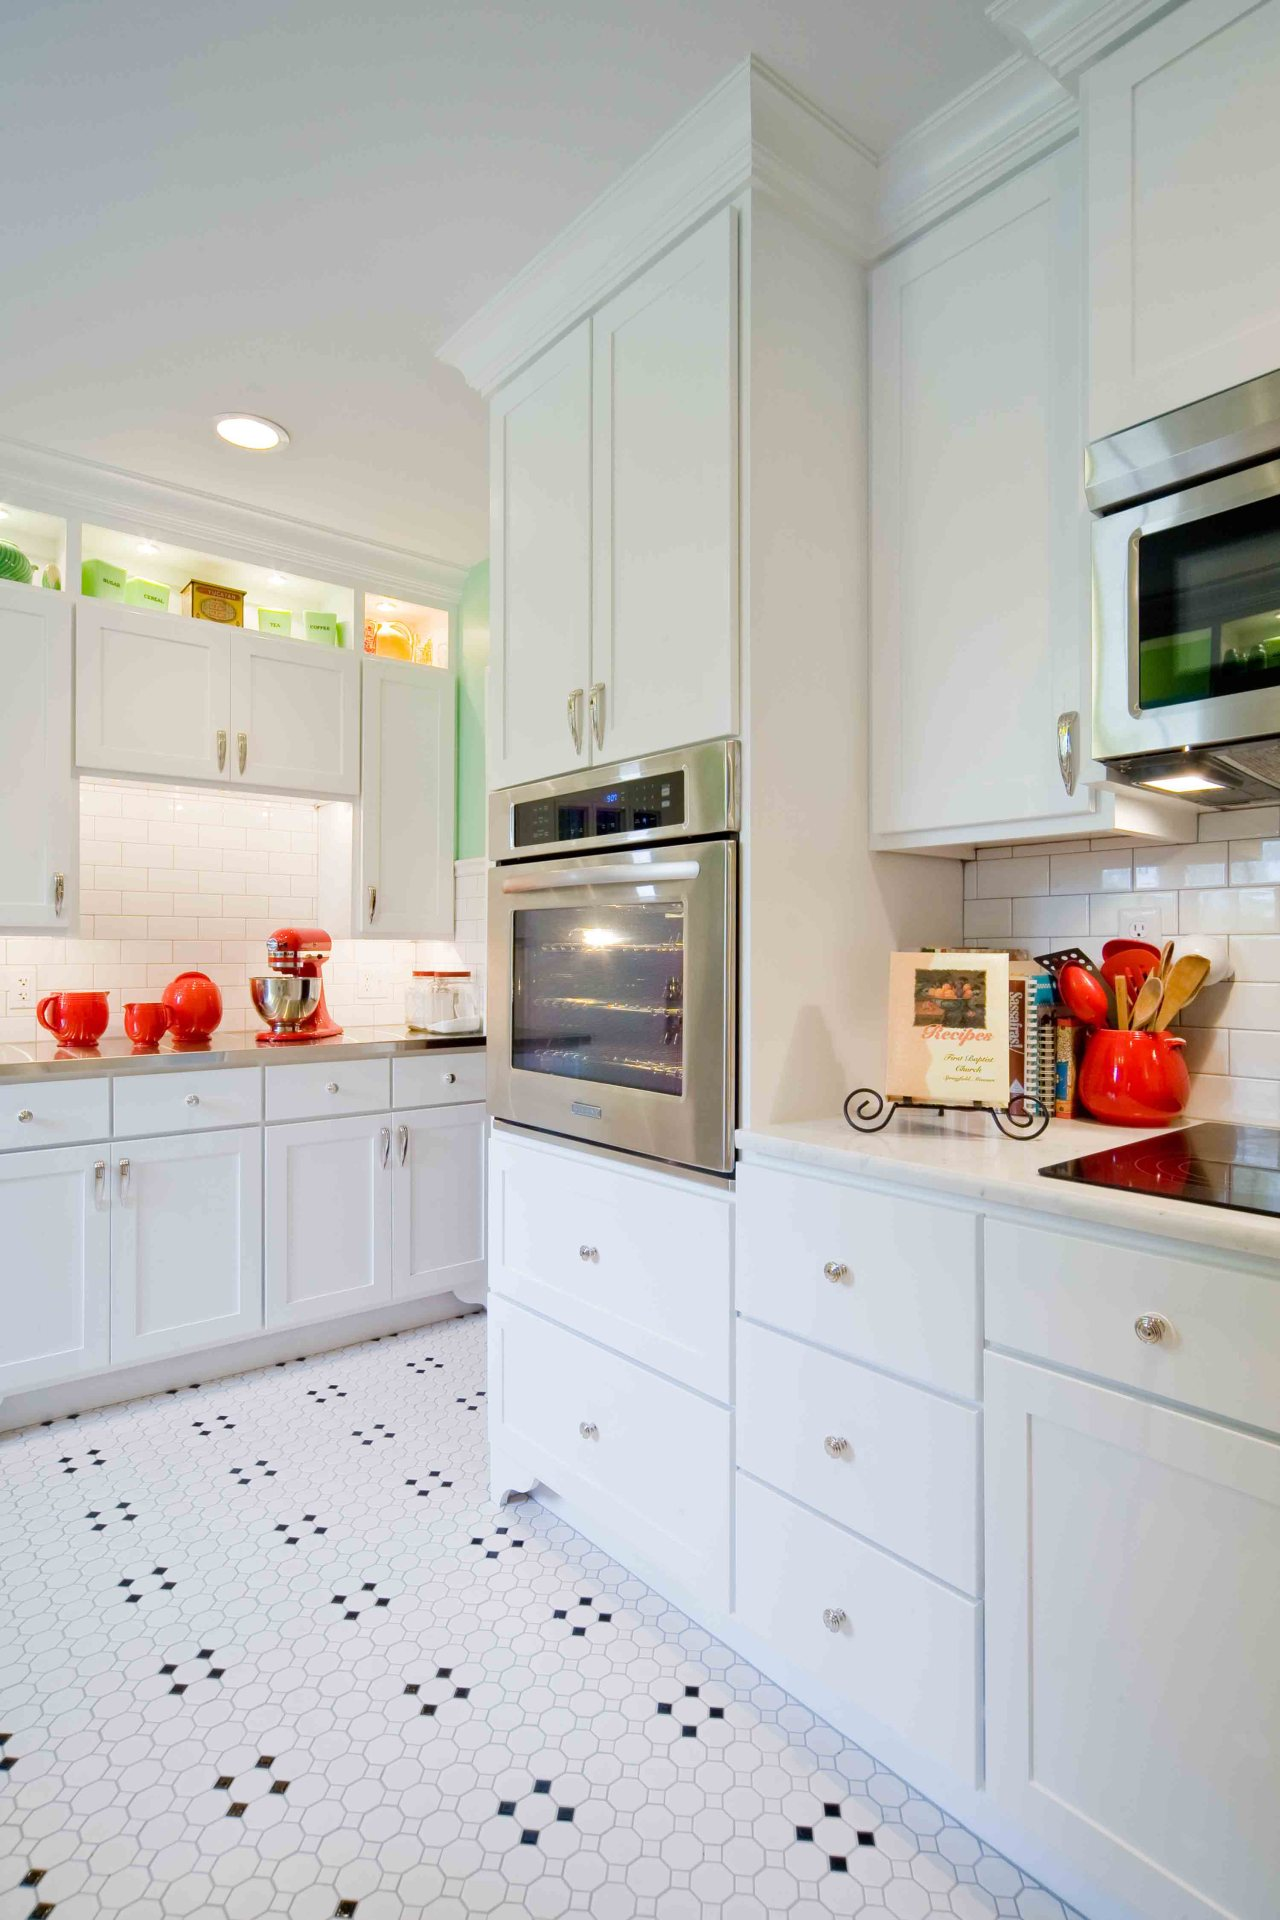 Vintage Charm Kitchen Remodel - Rhoads Design & Construction